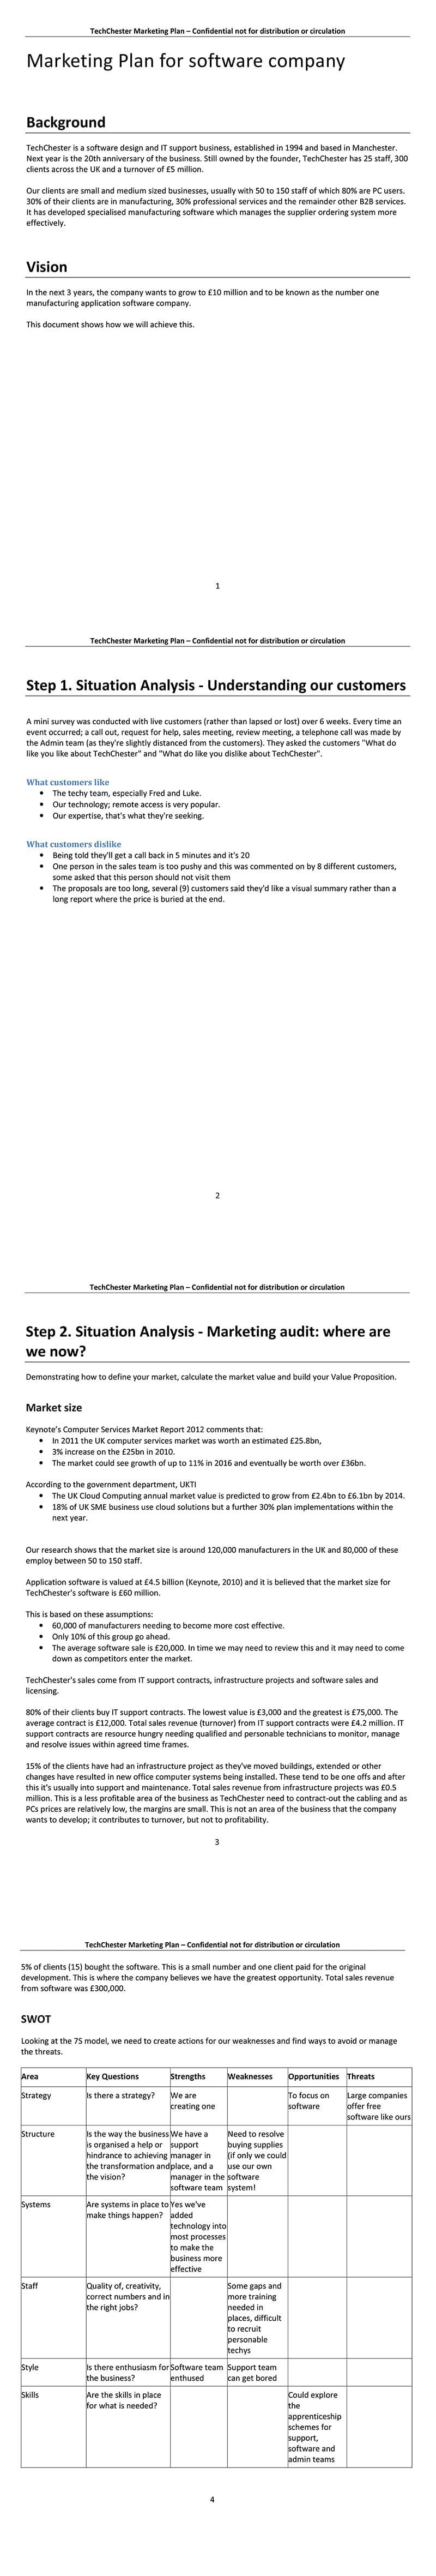 Example marketing plans (SOSTAC®)